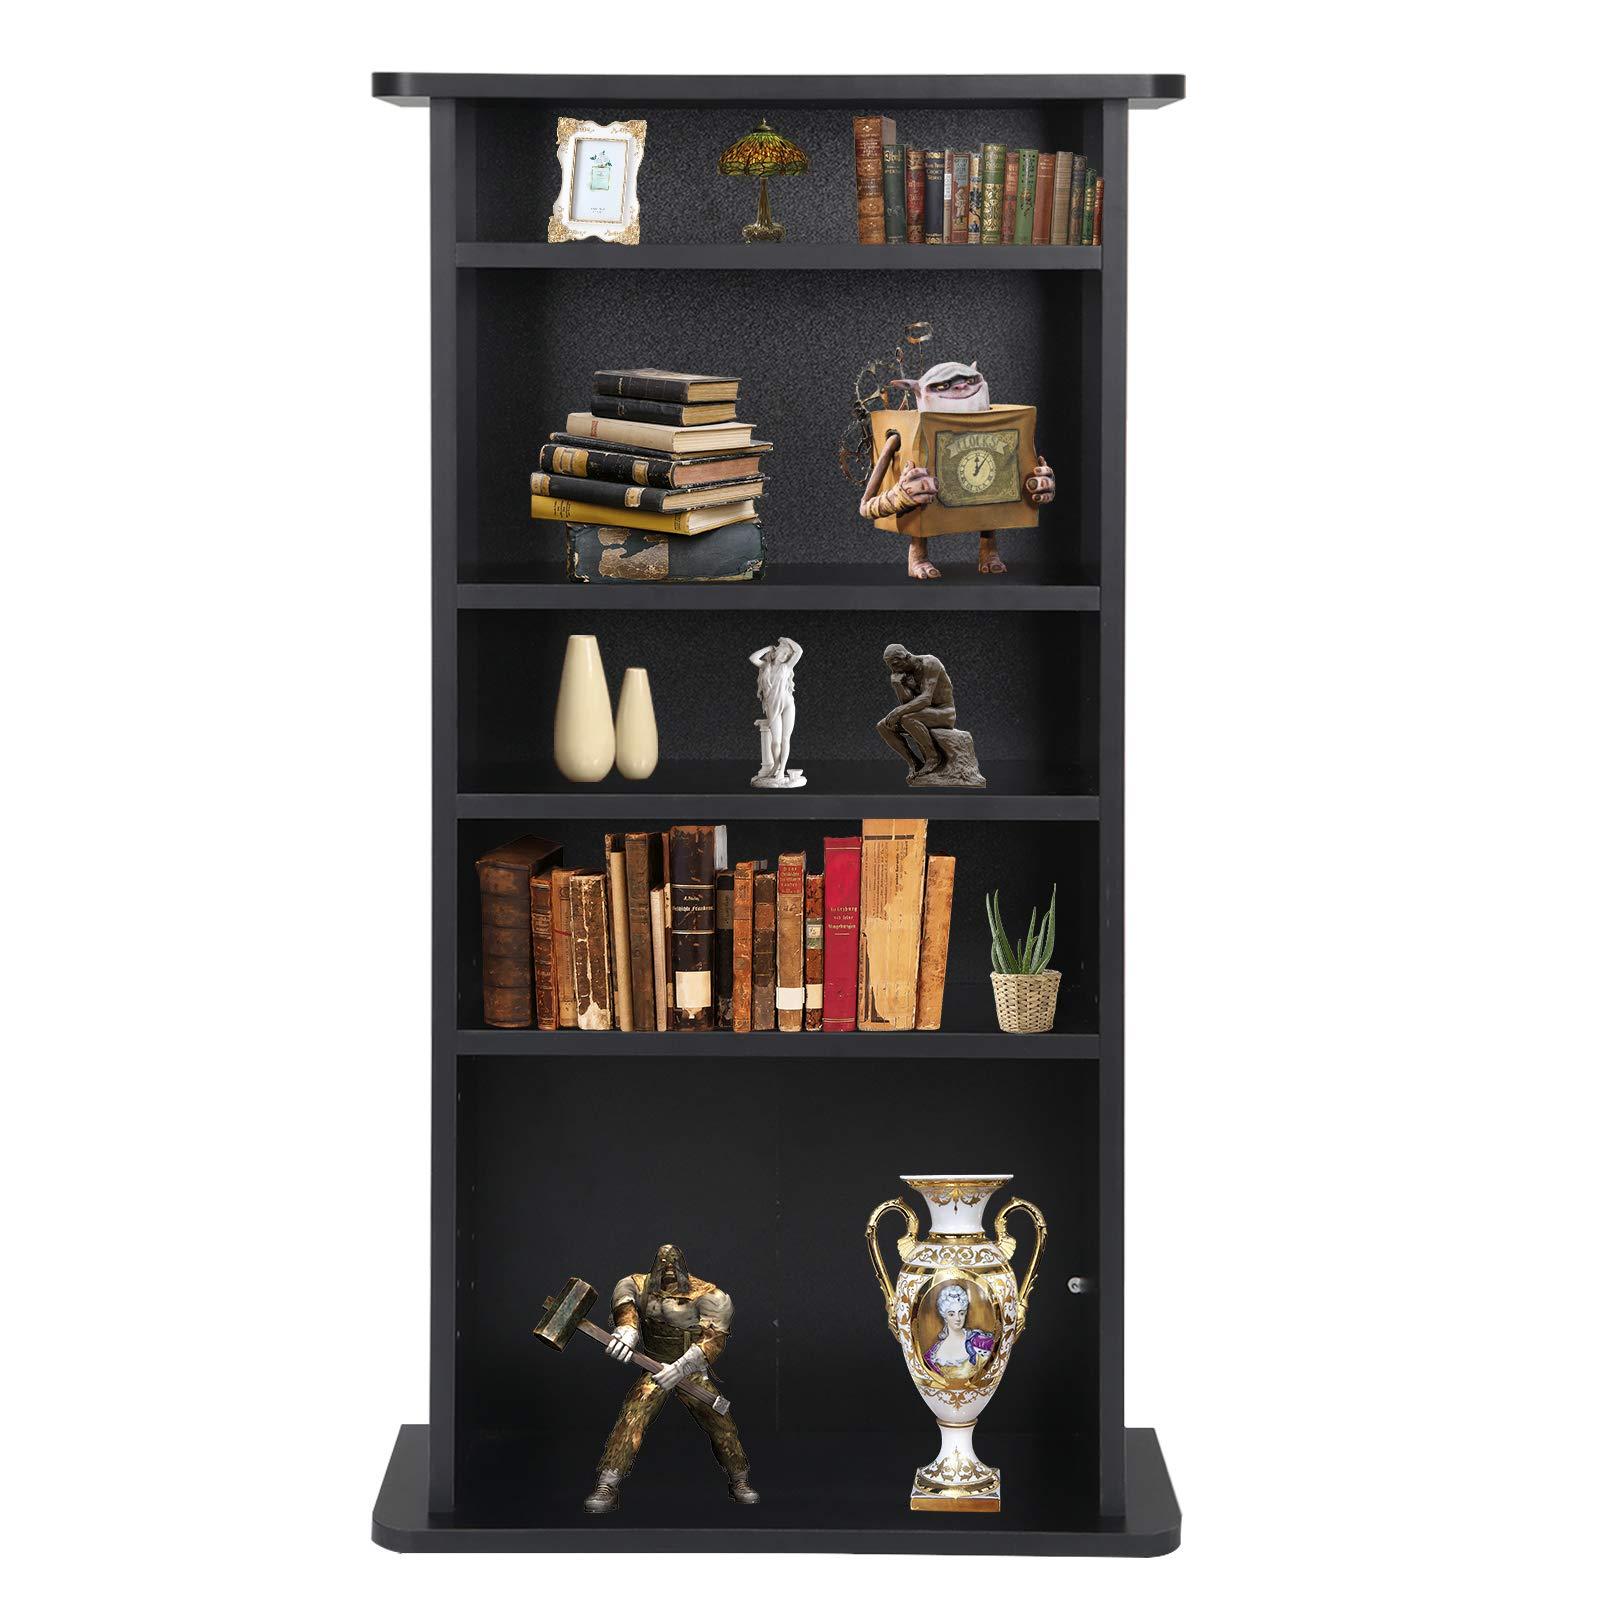 Nova Microdermabrasion Adjustable Media Storage Tower(DVD,CD,Games), 5-Tier Wooden Media Storage Organizer Cabinet, Bookshelf Display Bookcase for CDs, Books, Video Games, Arts by Nova Microdermabrasion